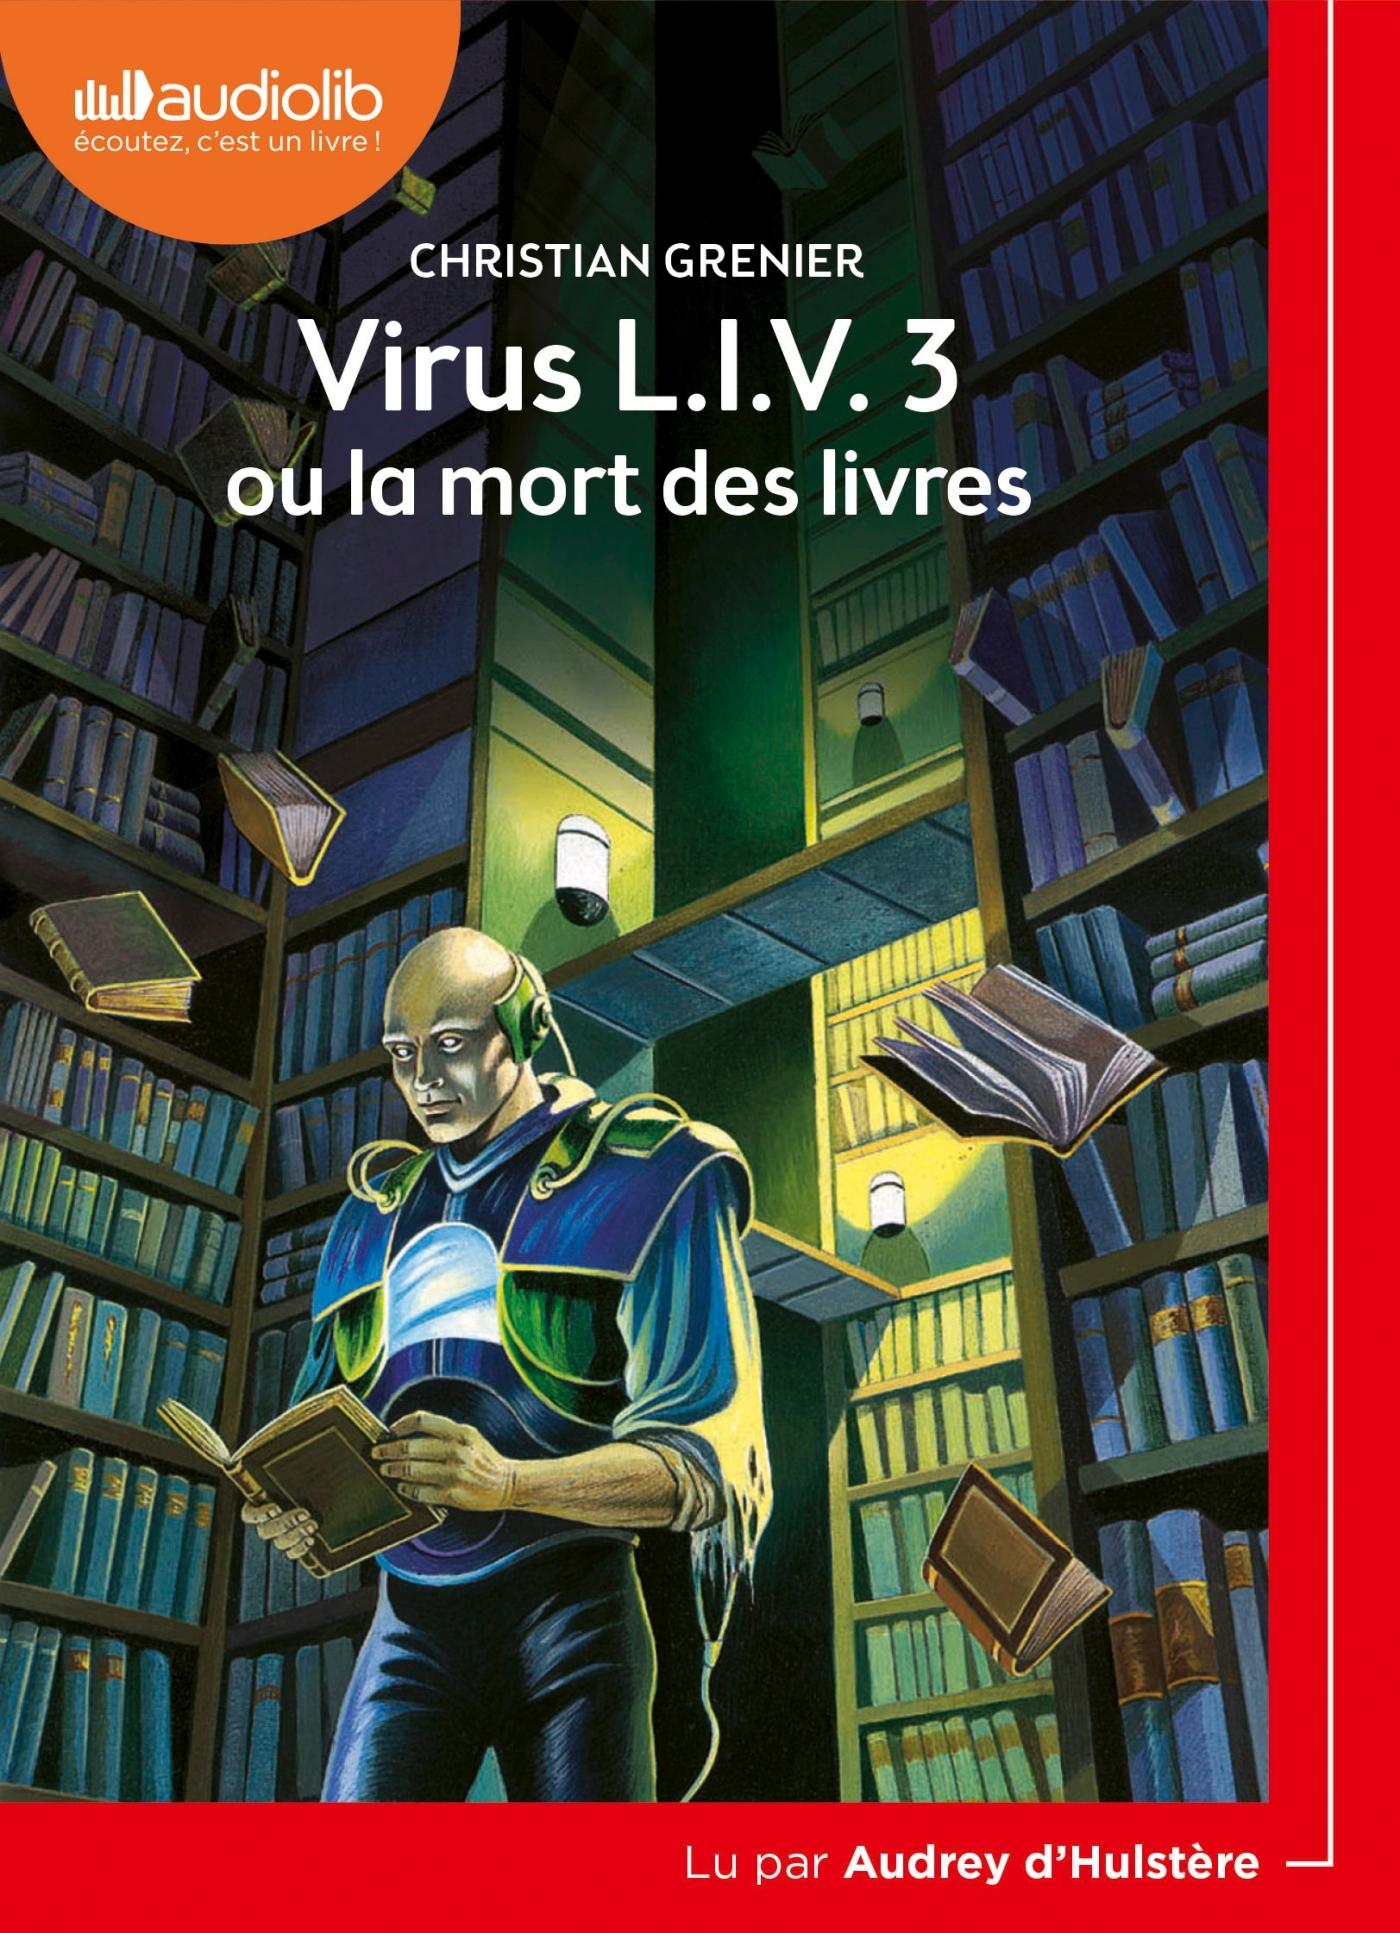 VIRUS L.I.V. 3 OU LA MORT DES LIVRES